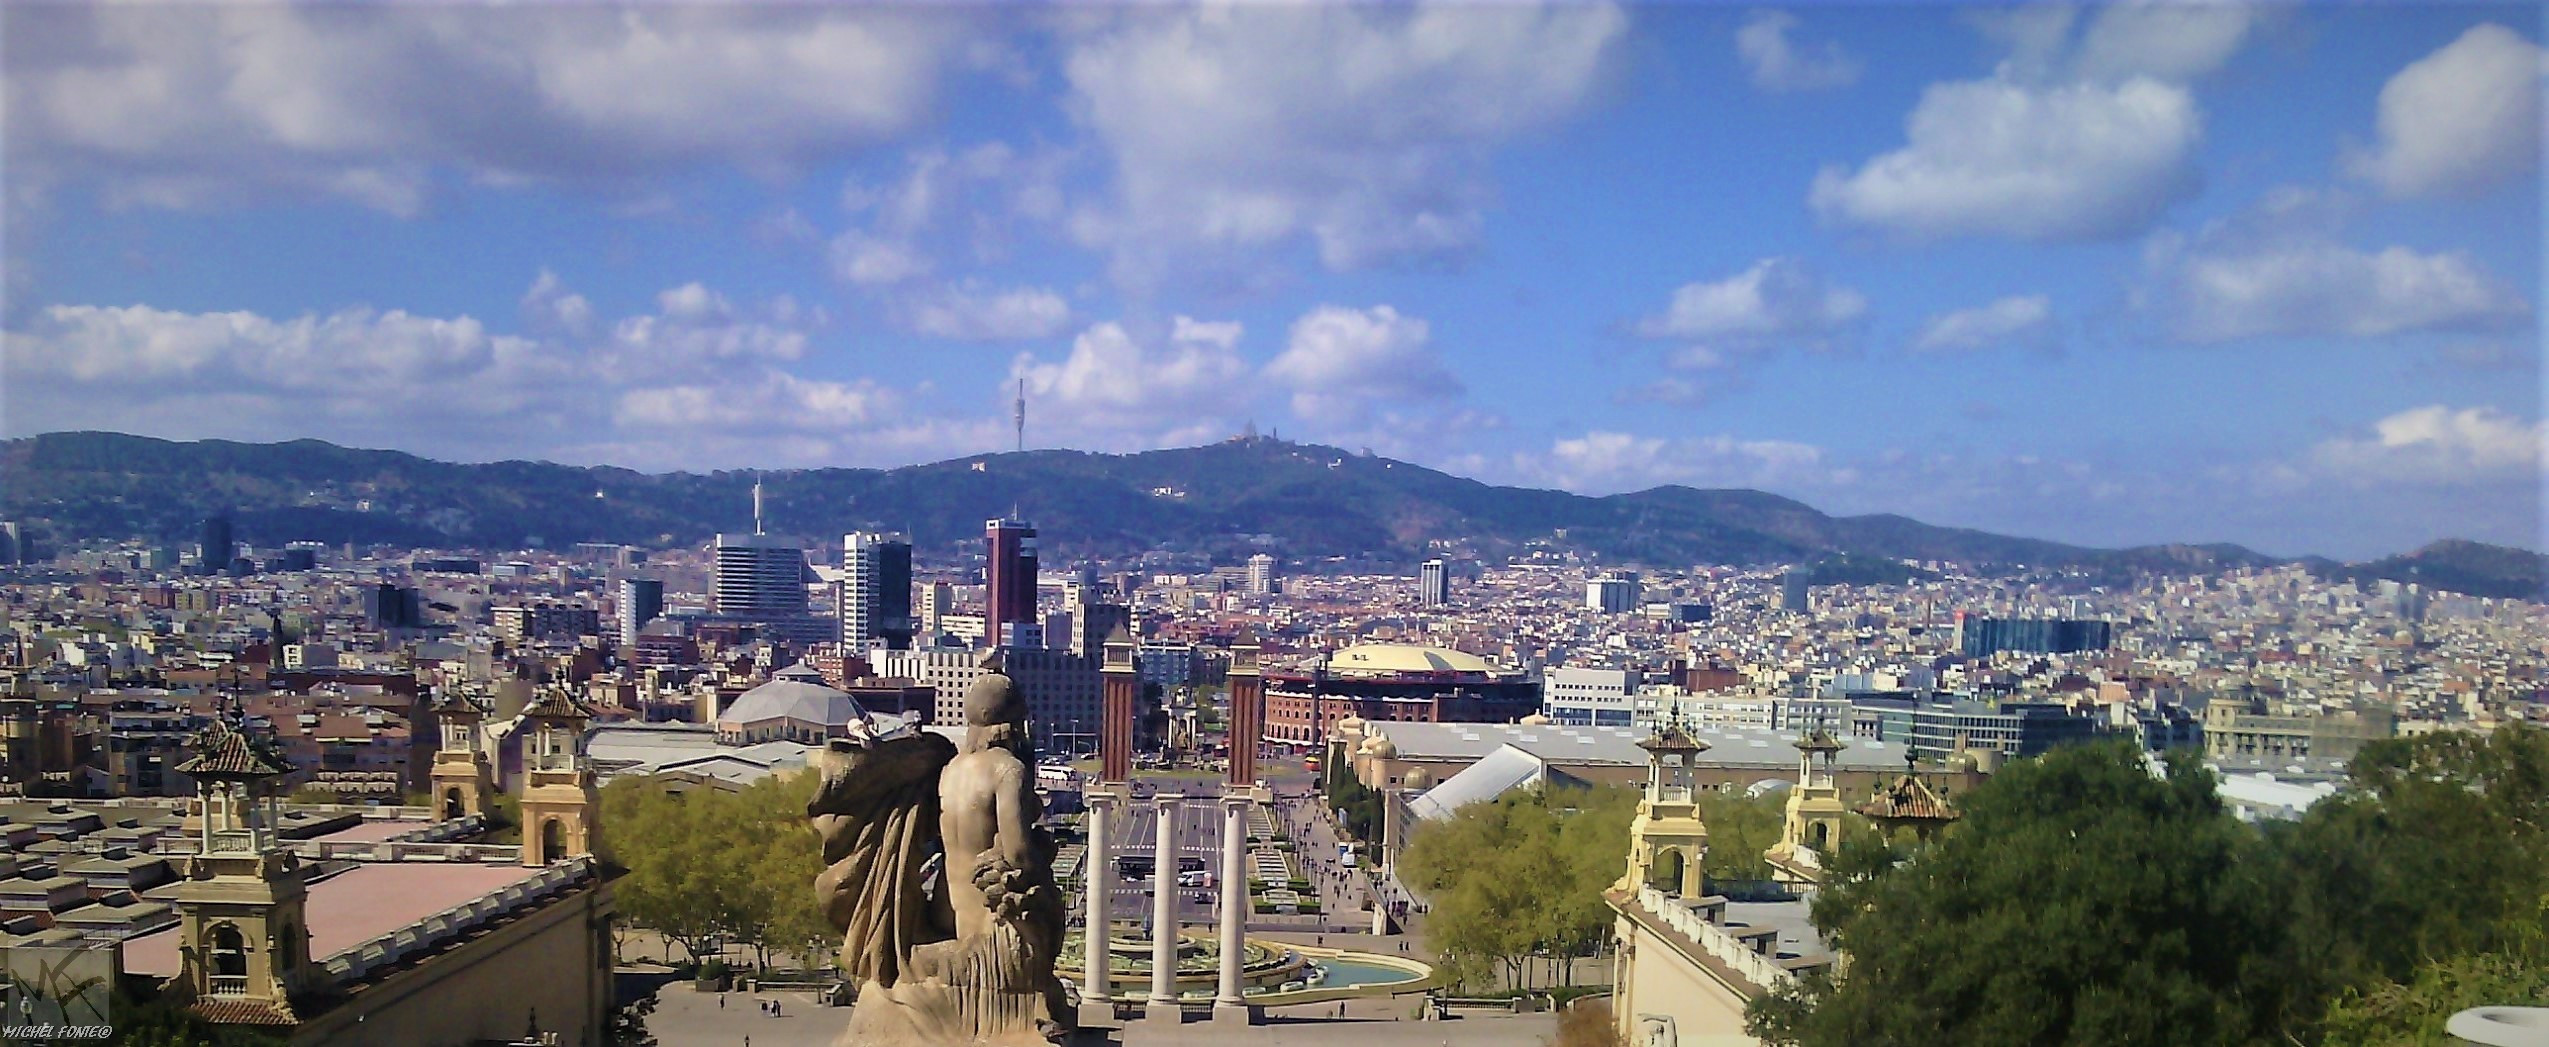 Agencias inmobiliarias españolas en España